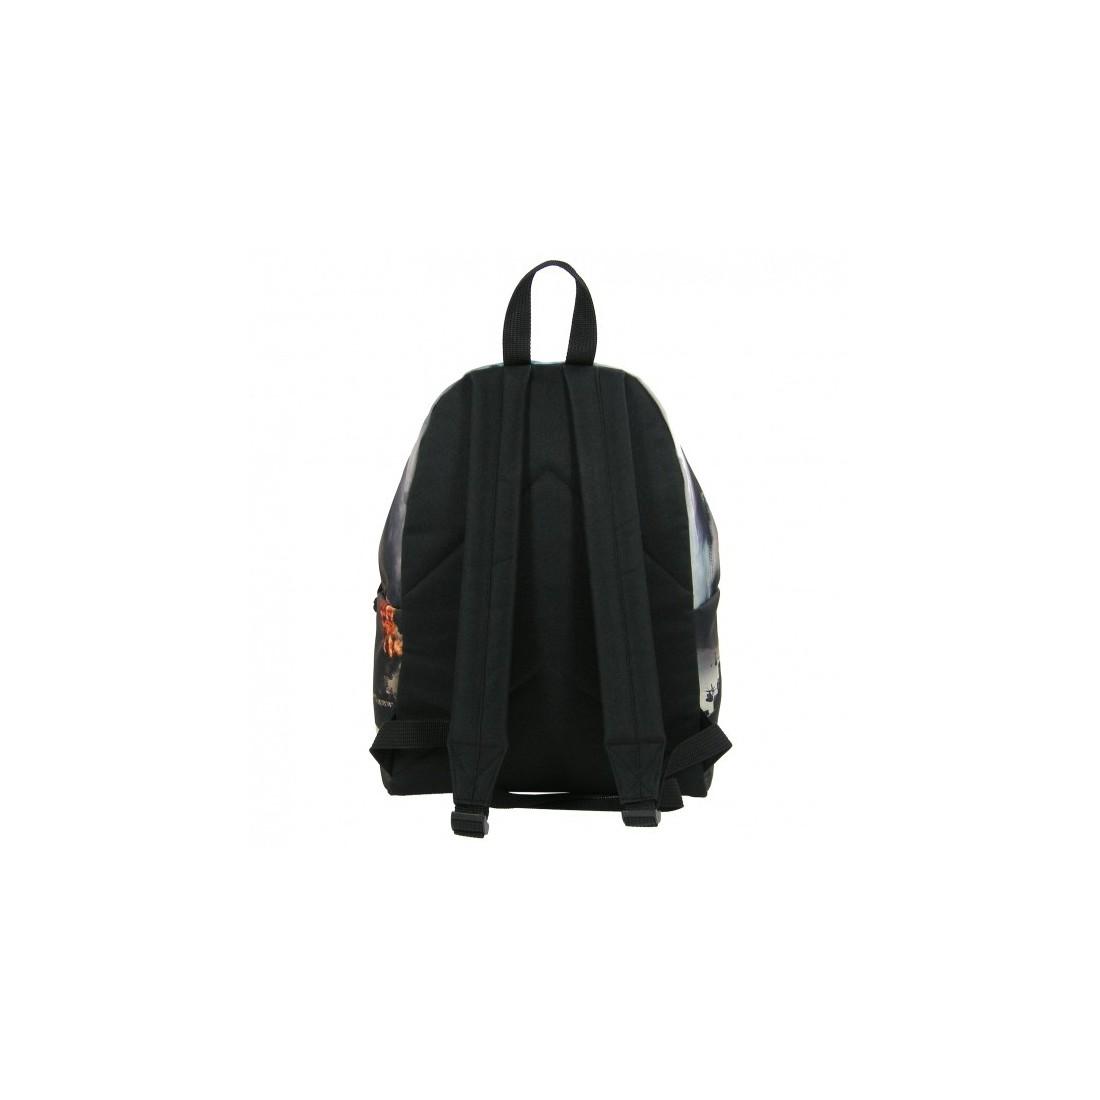 Plecak młodzieżowy Fullprint City - plecak-tornister.pl